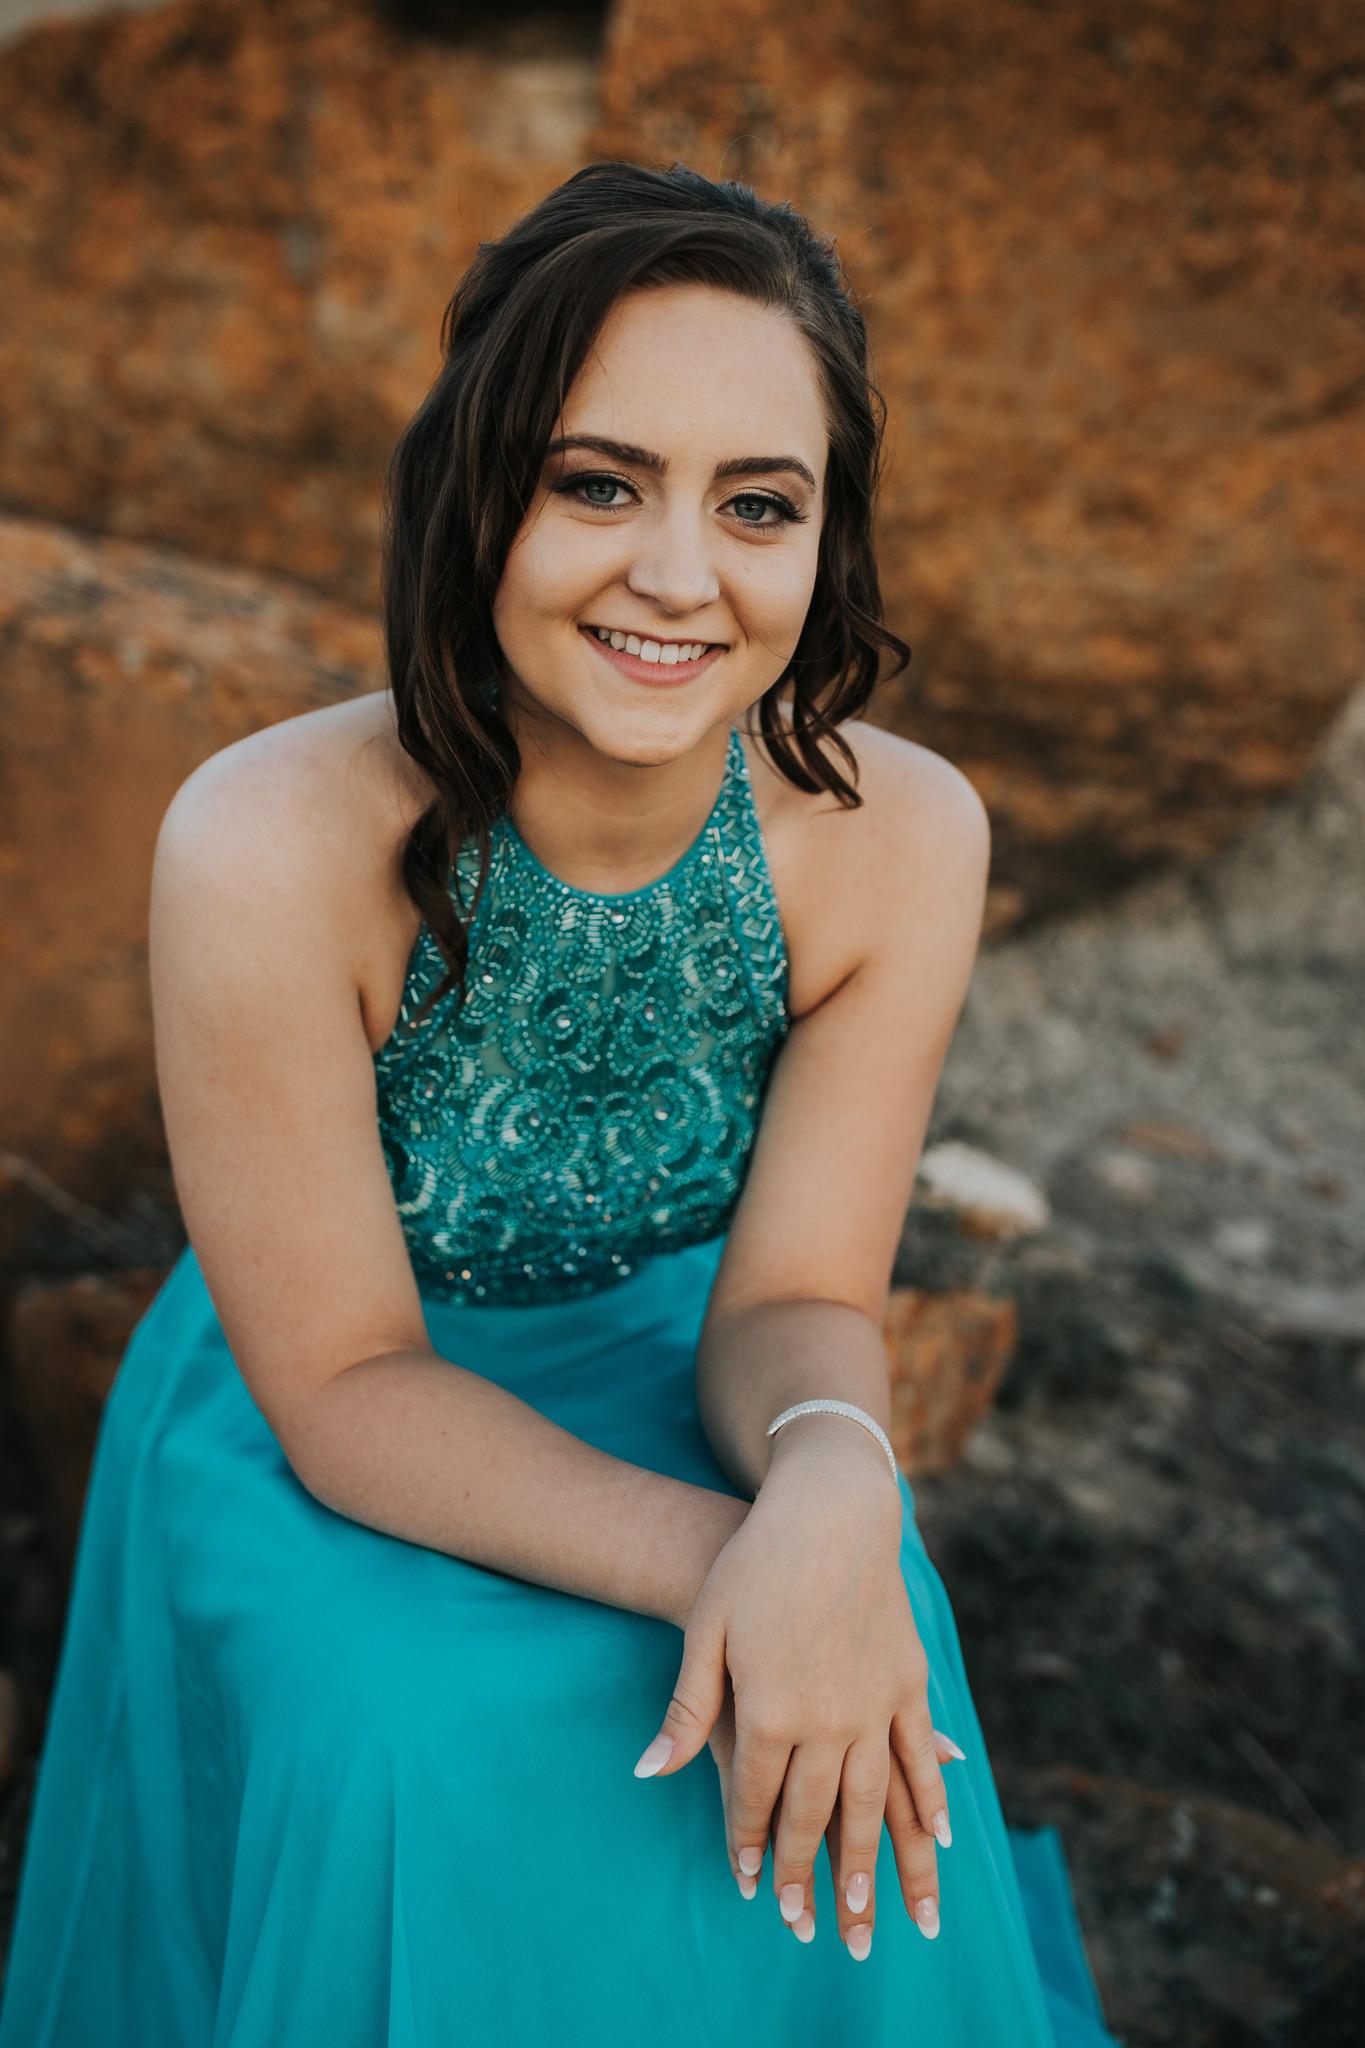 beautiful graduate sitting leaning forward smiling